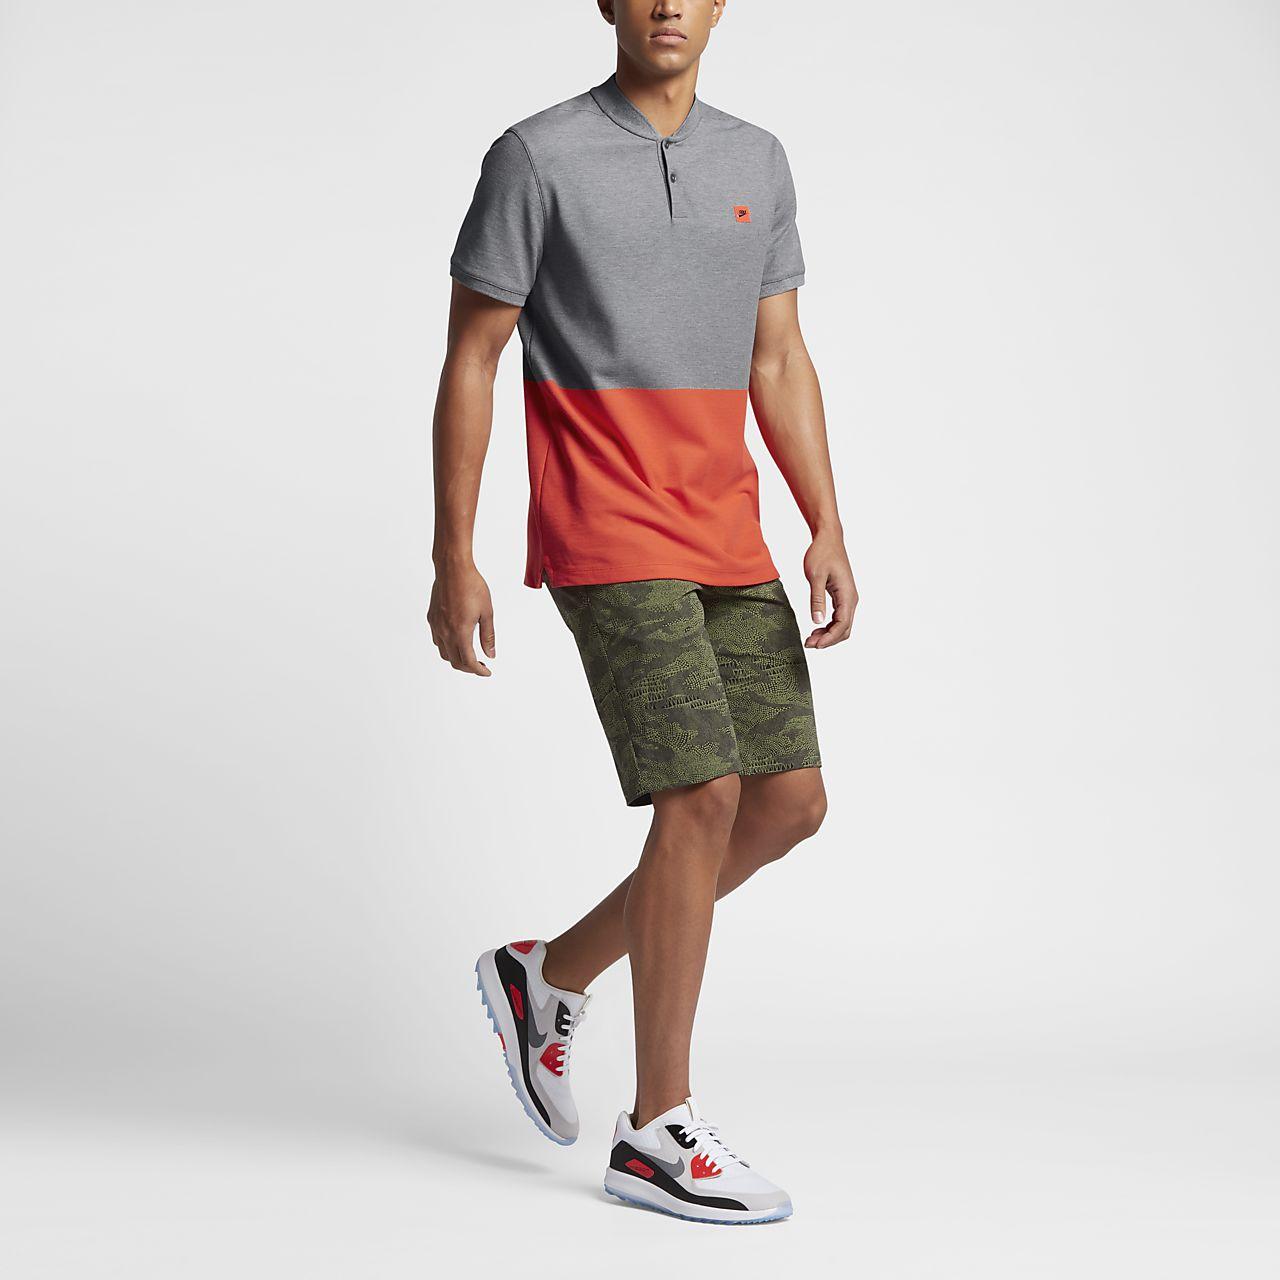 aab1b85bfbe8f Nike Dry Desert Blade Men's Slim Fit Golf Polo. Nike.com VN